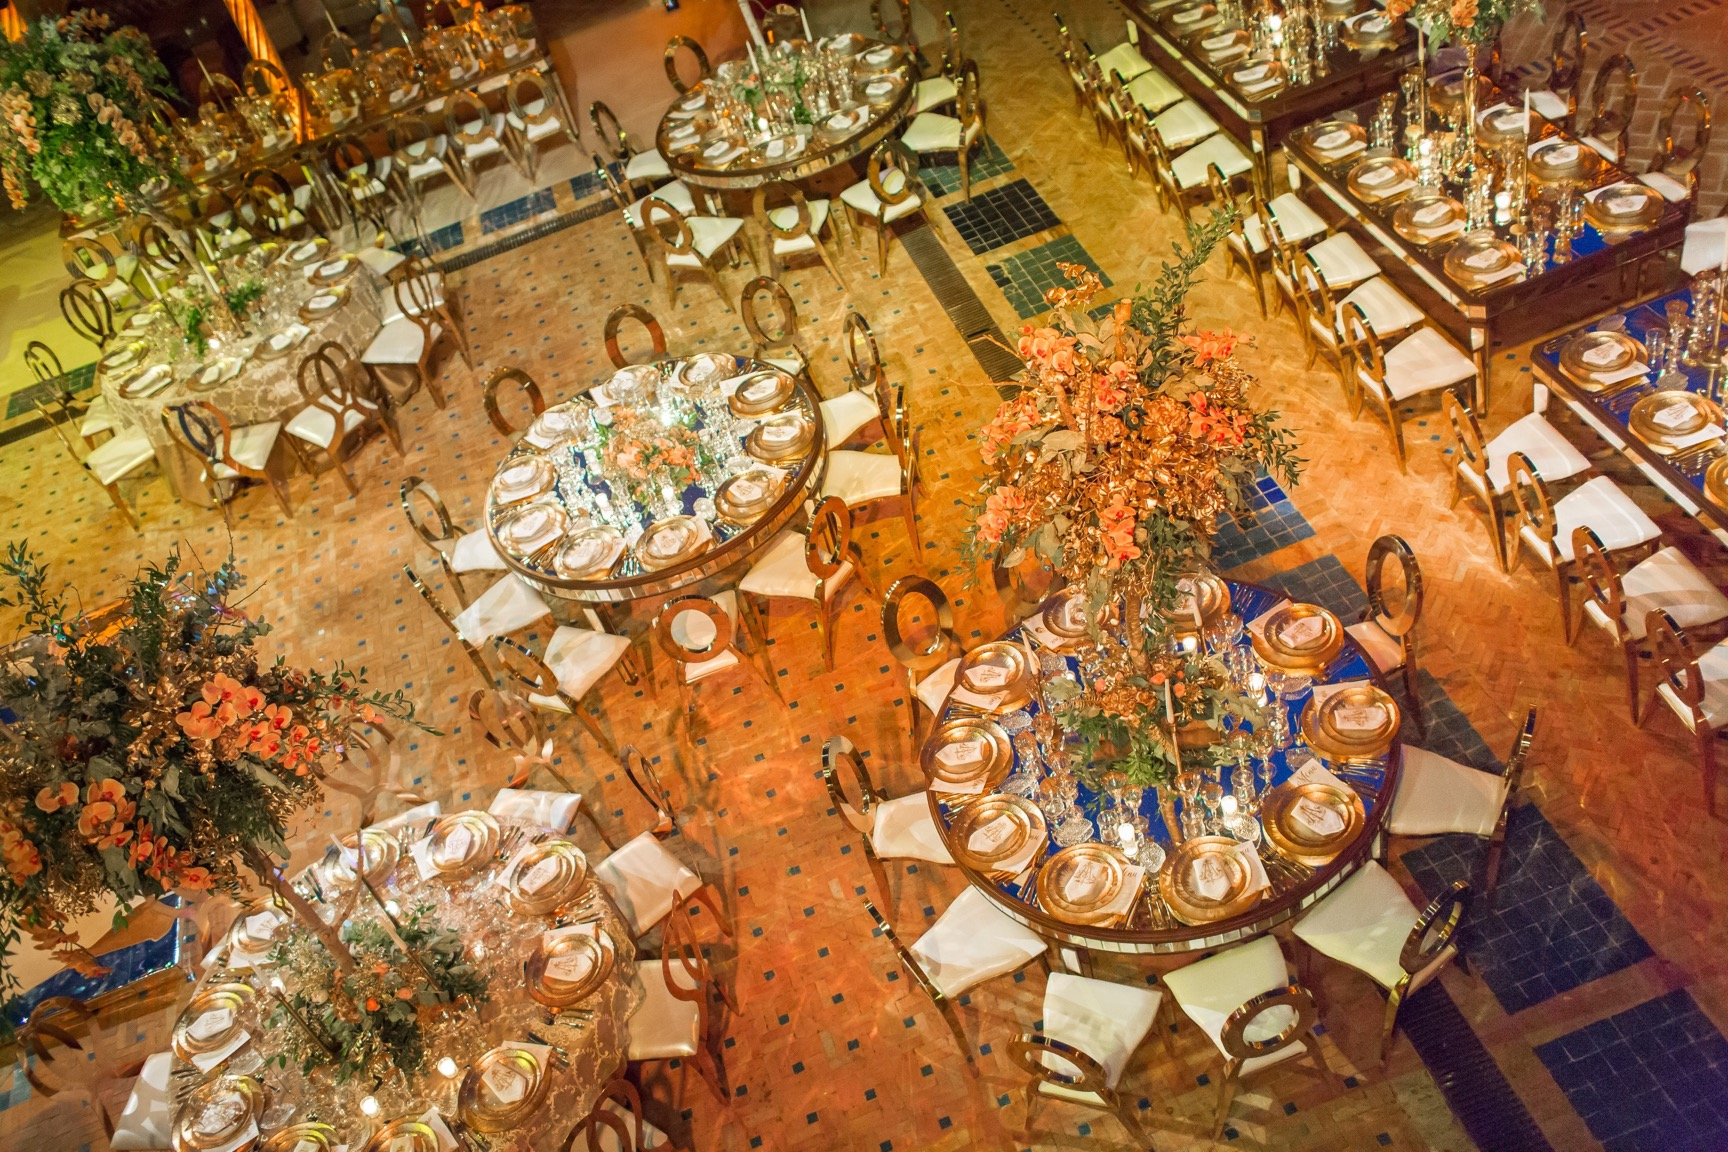 Si-Quiero-Wedding-Planner-By-Sira-Antequera-Bodas-Málaga-Marbella-Miami- L-A-37